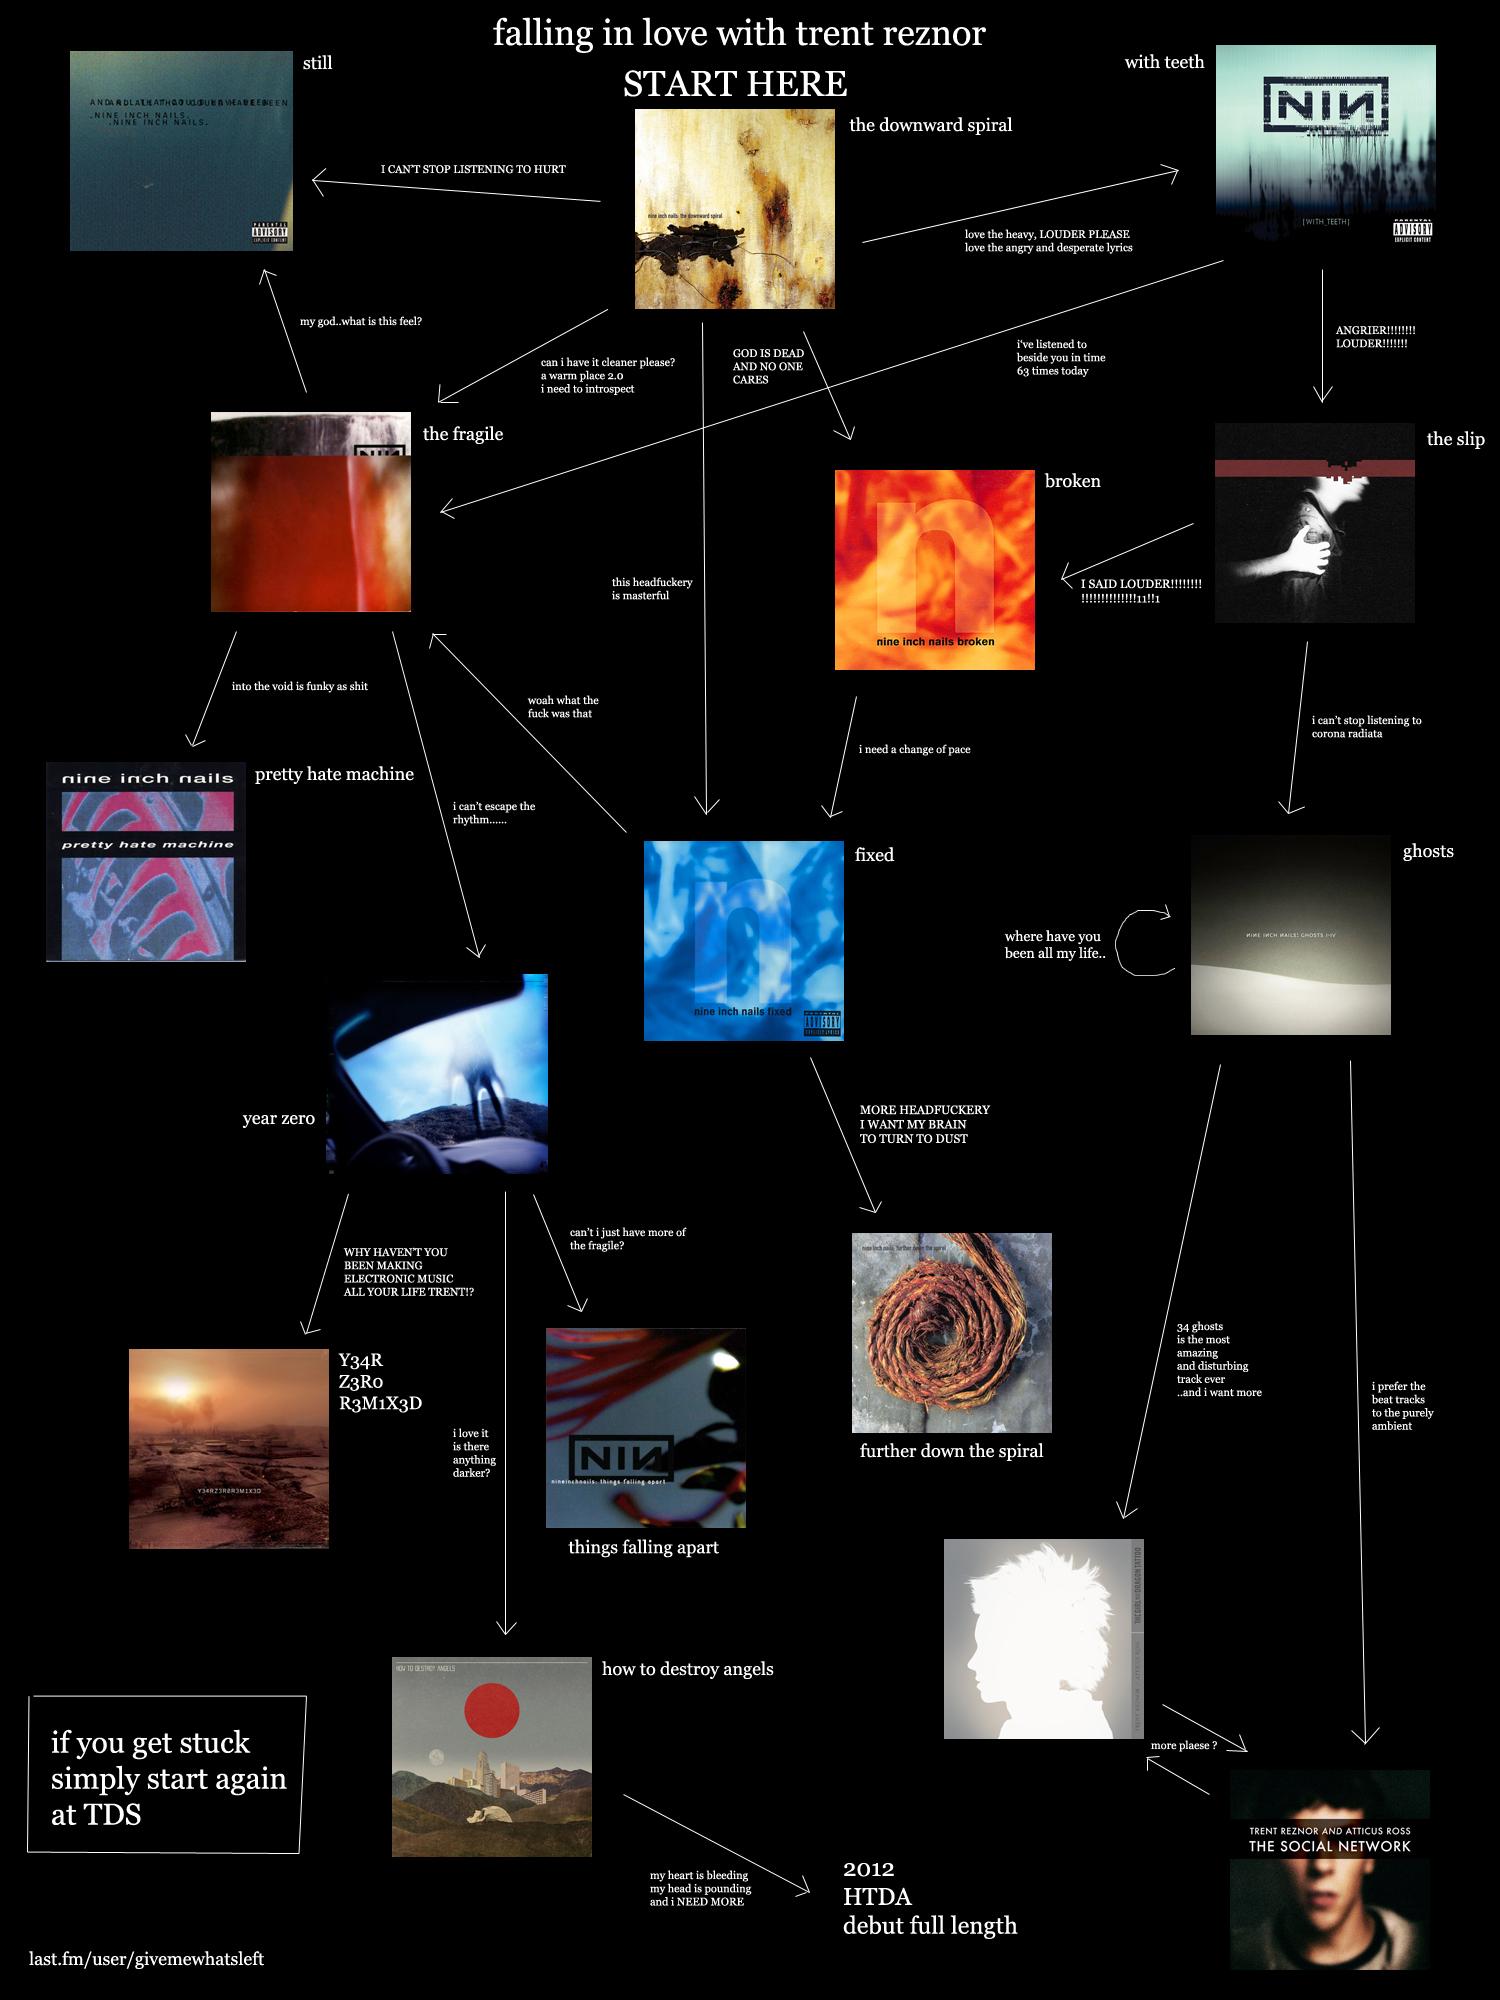 Image - Trent reznor flowchart.jpg | 4chanmusic Wiki | FANDOM ...